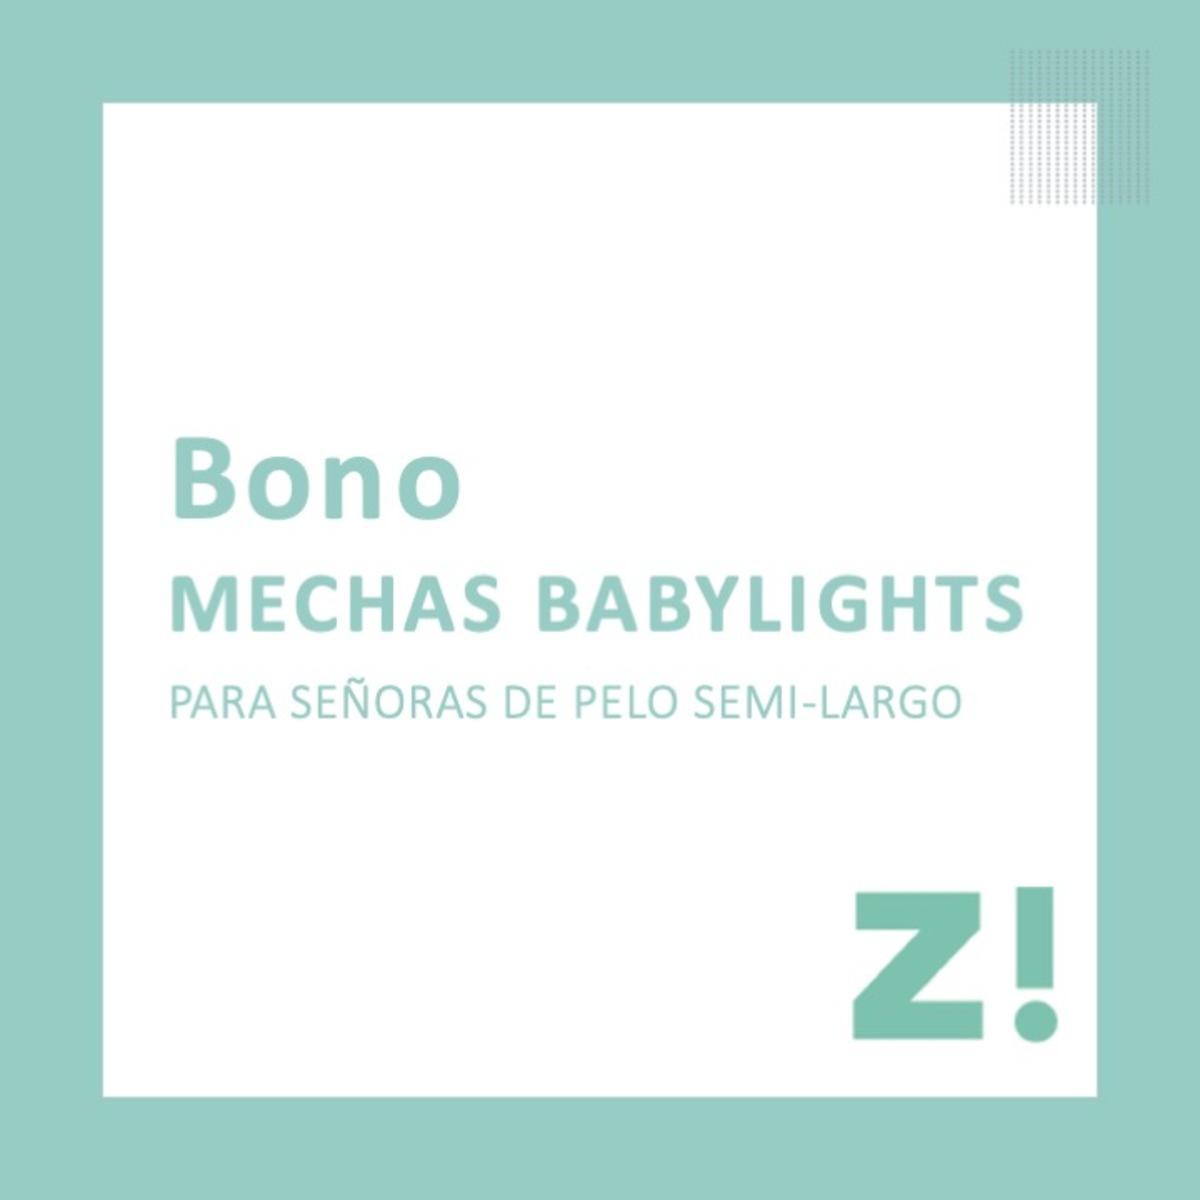 Bono mechas babylights para pelo medio PARA CANJEAR EN PASSARÓ PLAZA SAN BRIZ